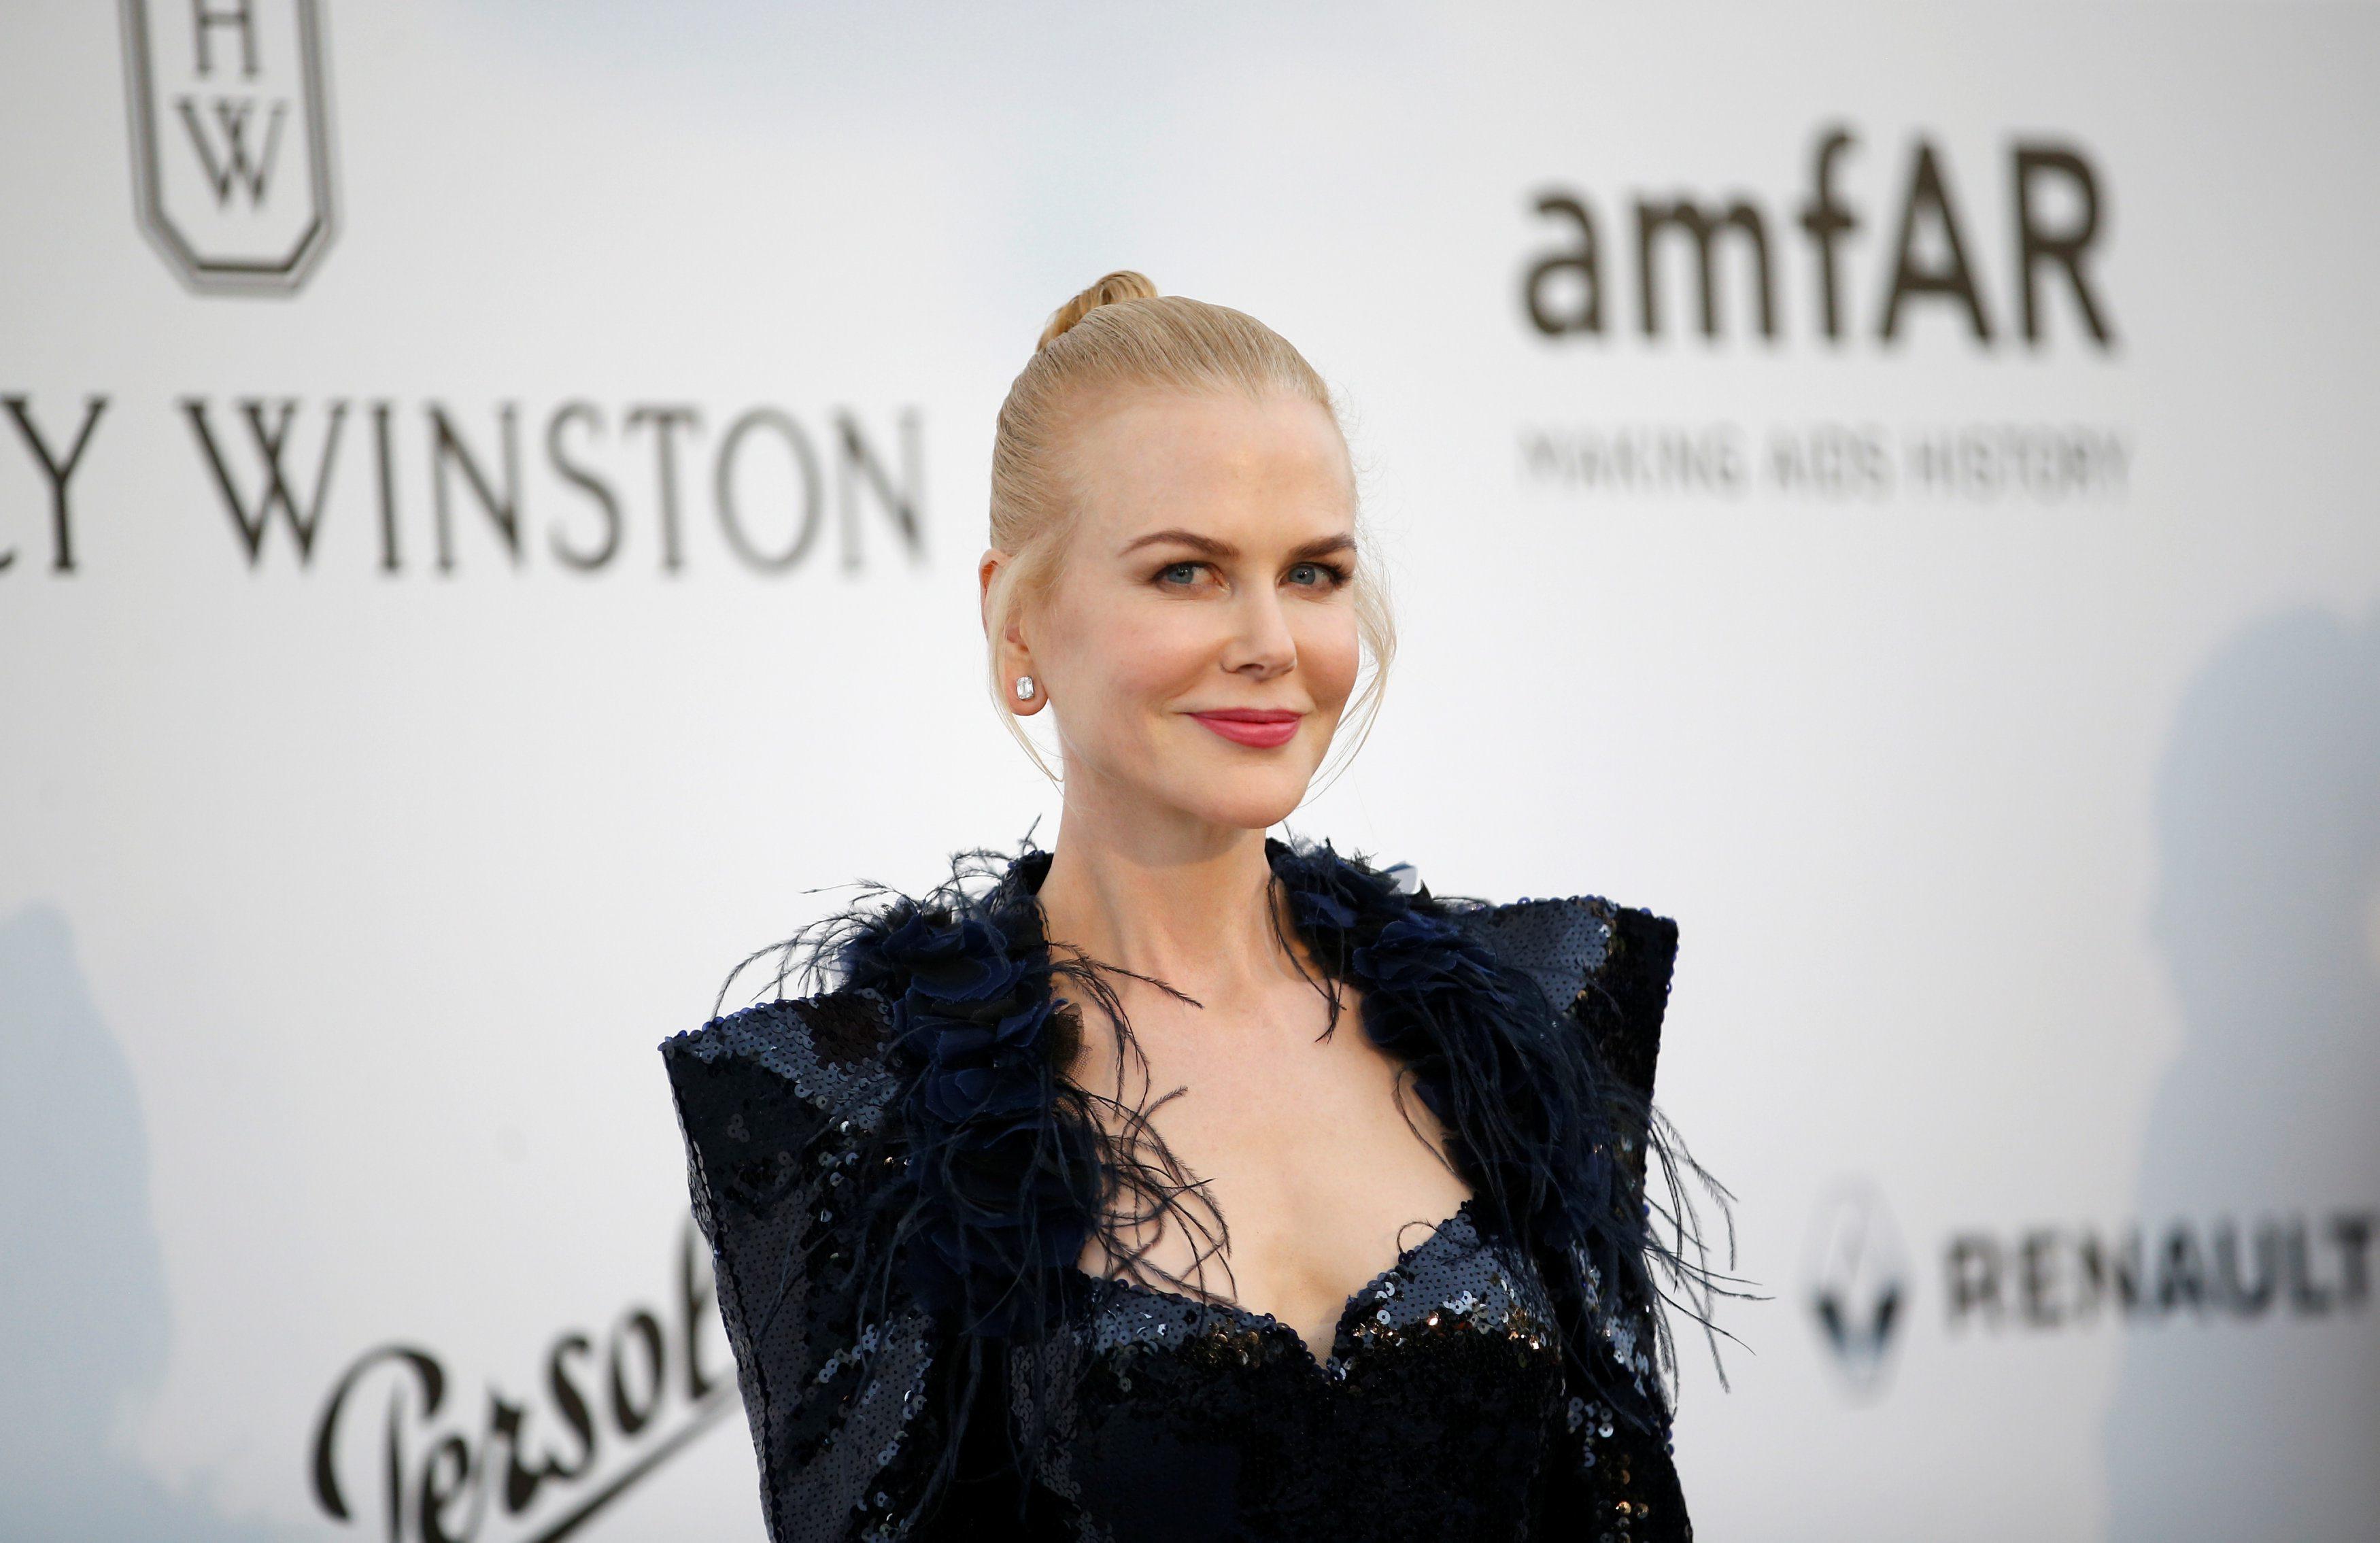 70th Cannes Film Festival Äi The amfAR's Cinema Against AIDS 2017 event Äi Photocall Arrivals - Antibes, France. 25/05/2017. Actress Nicole Kidman poses.       REUTERS/Stephane Mahe